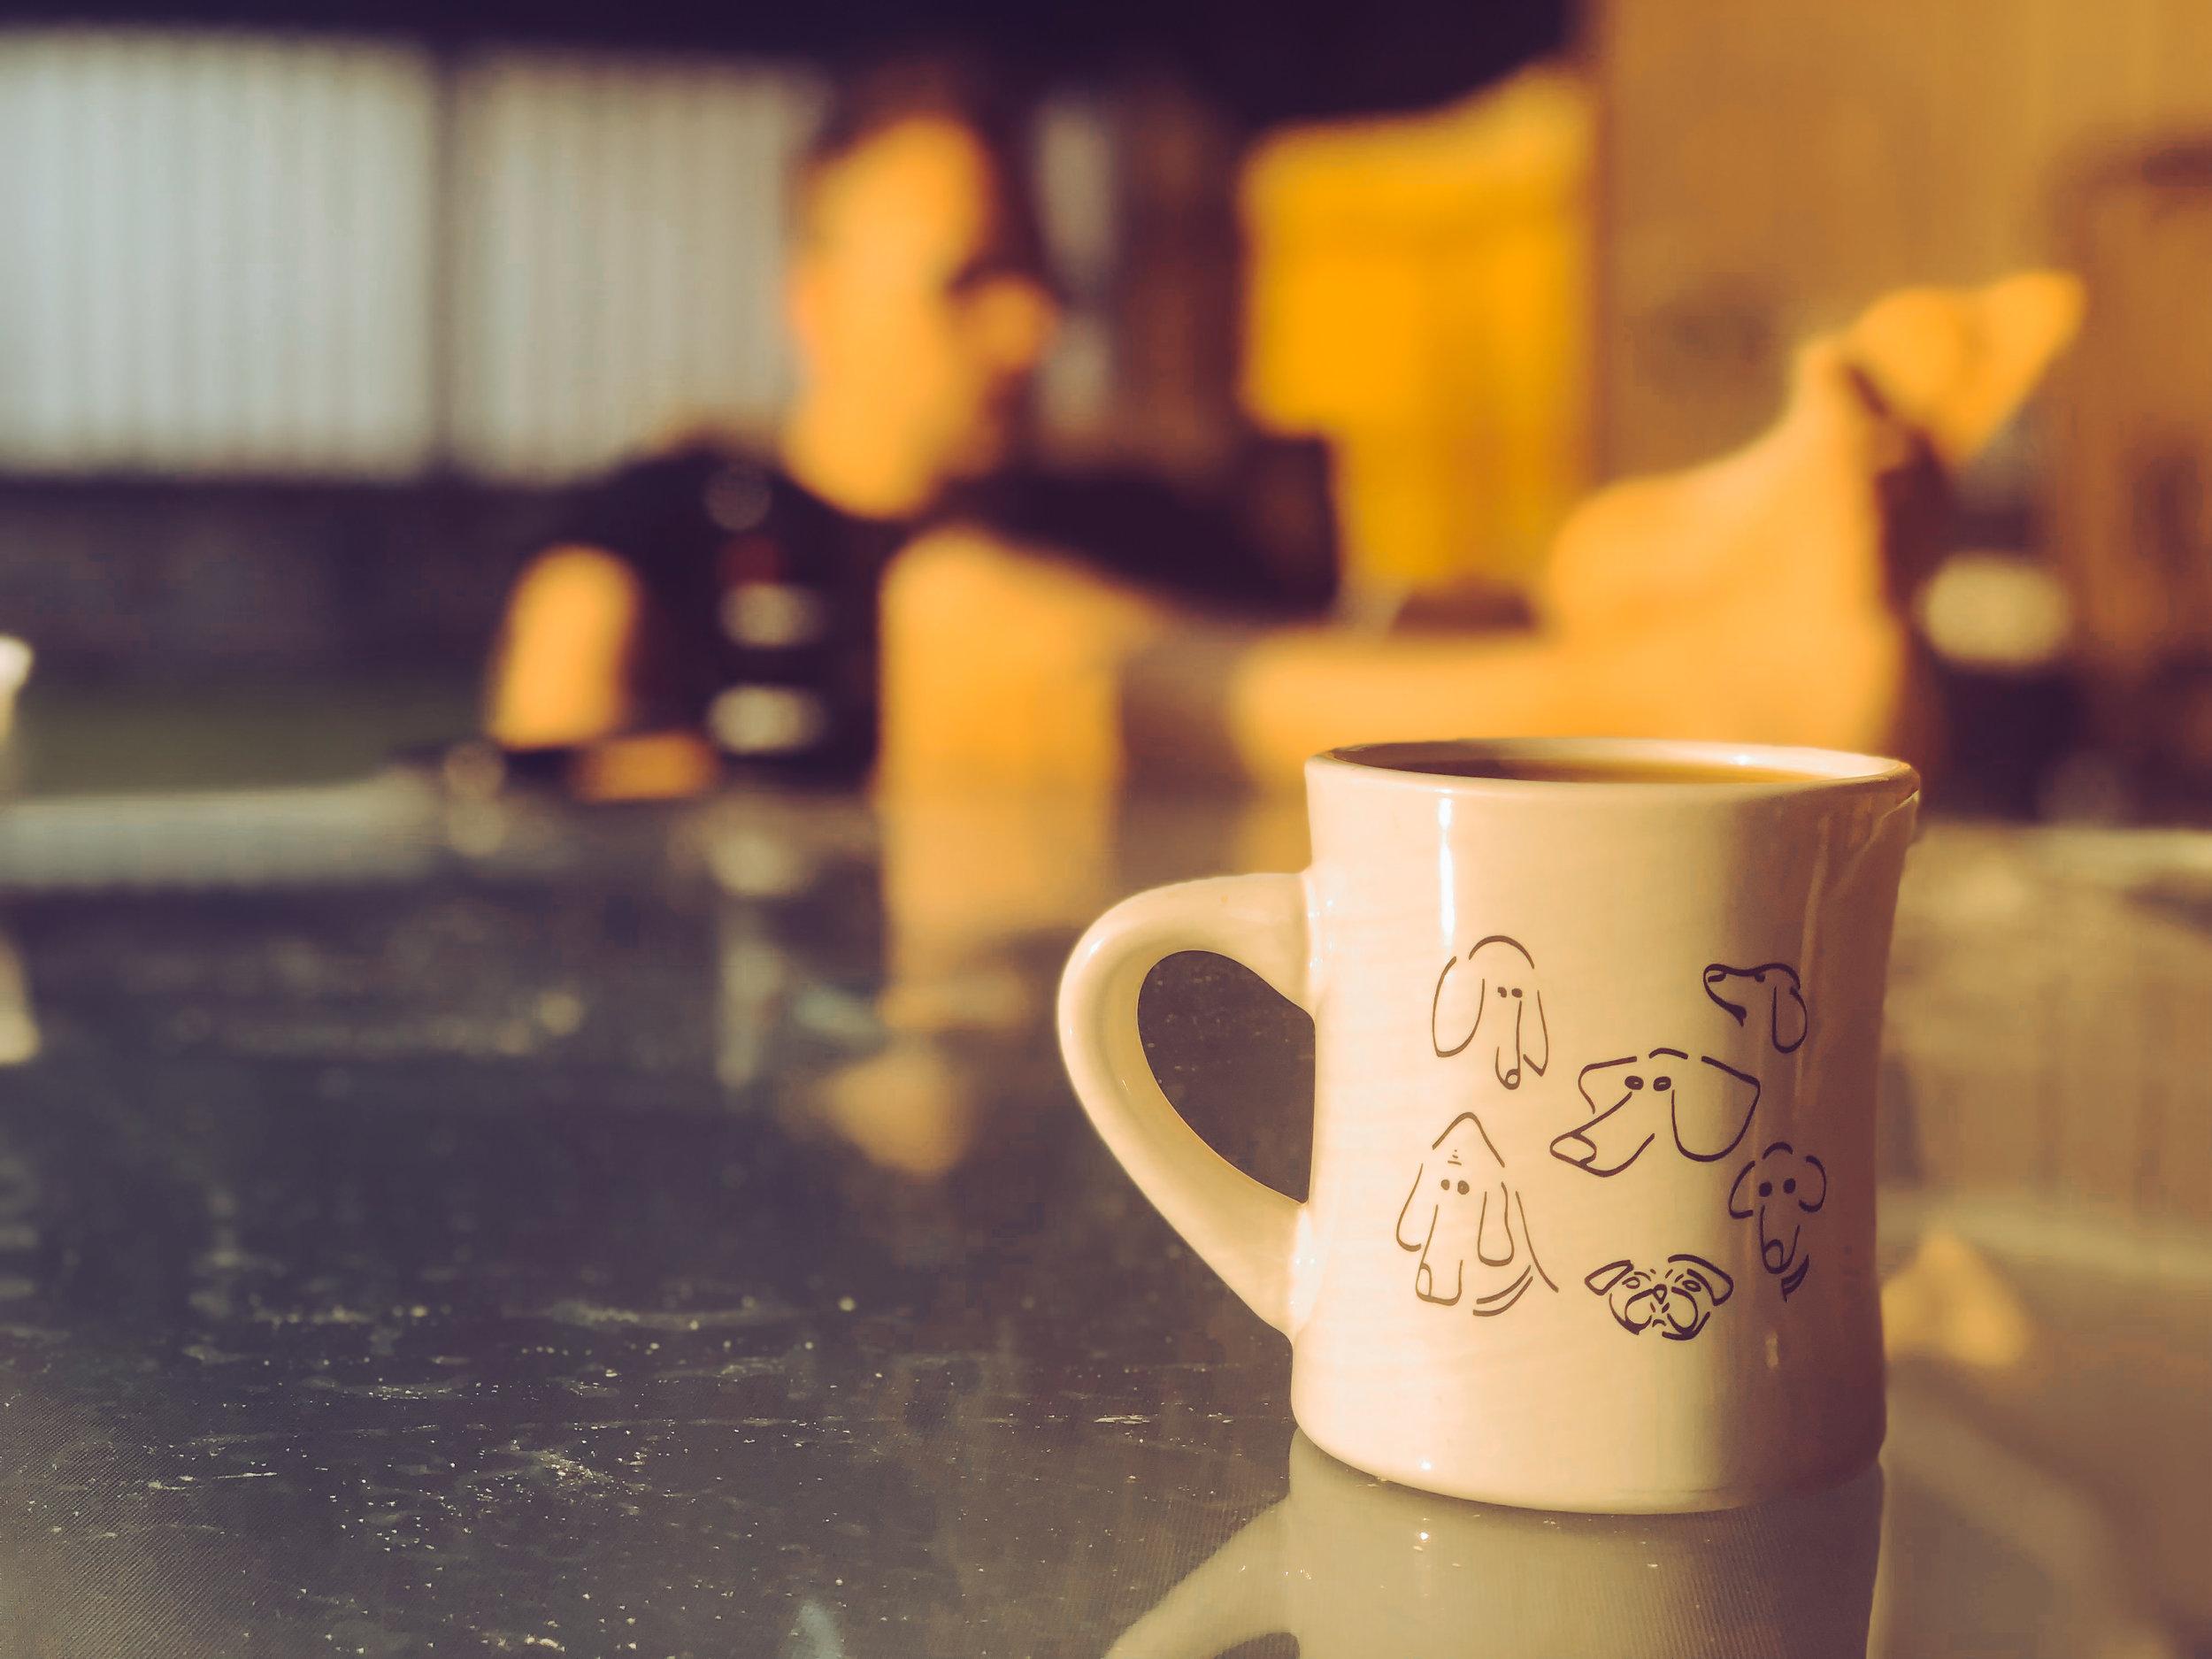 Enjoying the Eastern Washington sun and my favorite mug at my parent's house